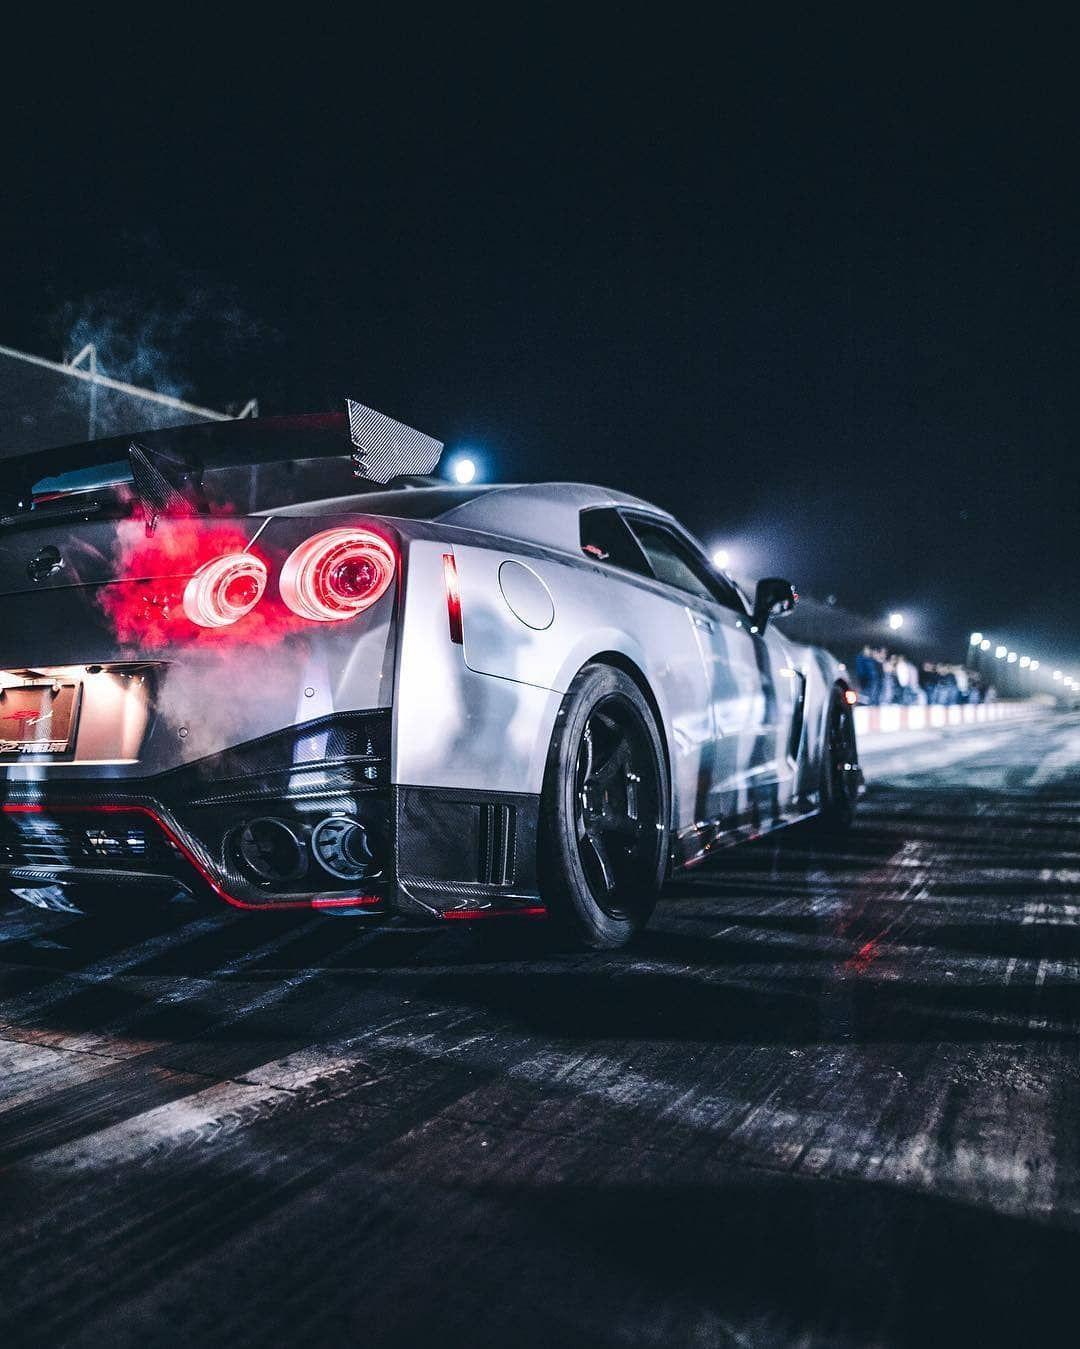 Gtr Power Jdm Street Racing Cars Nissan Gtr Wallpapers Gtr